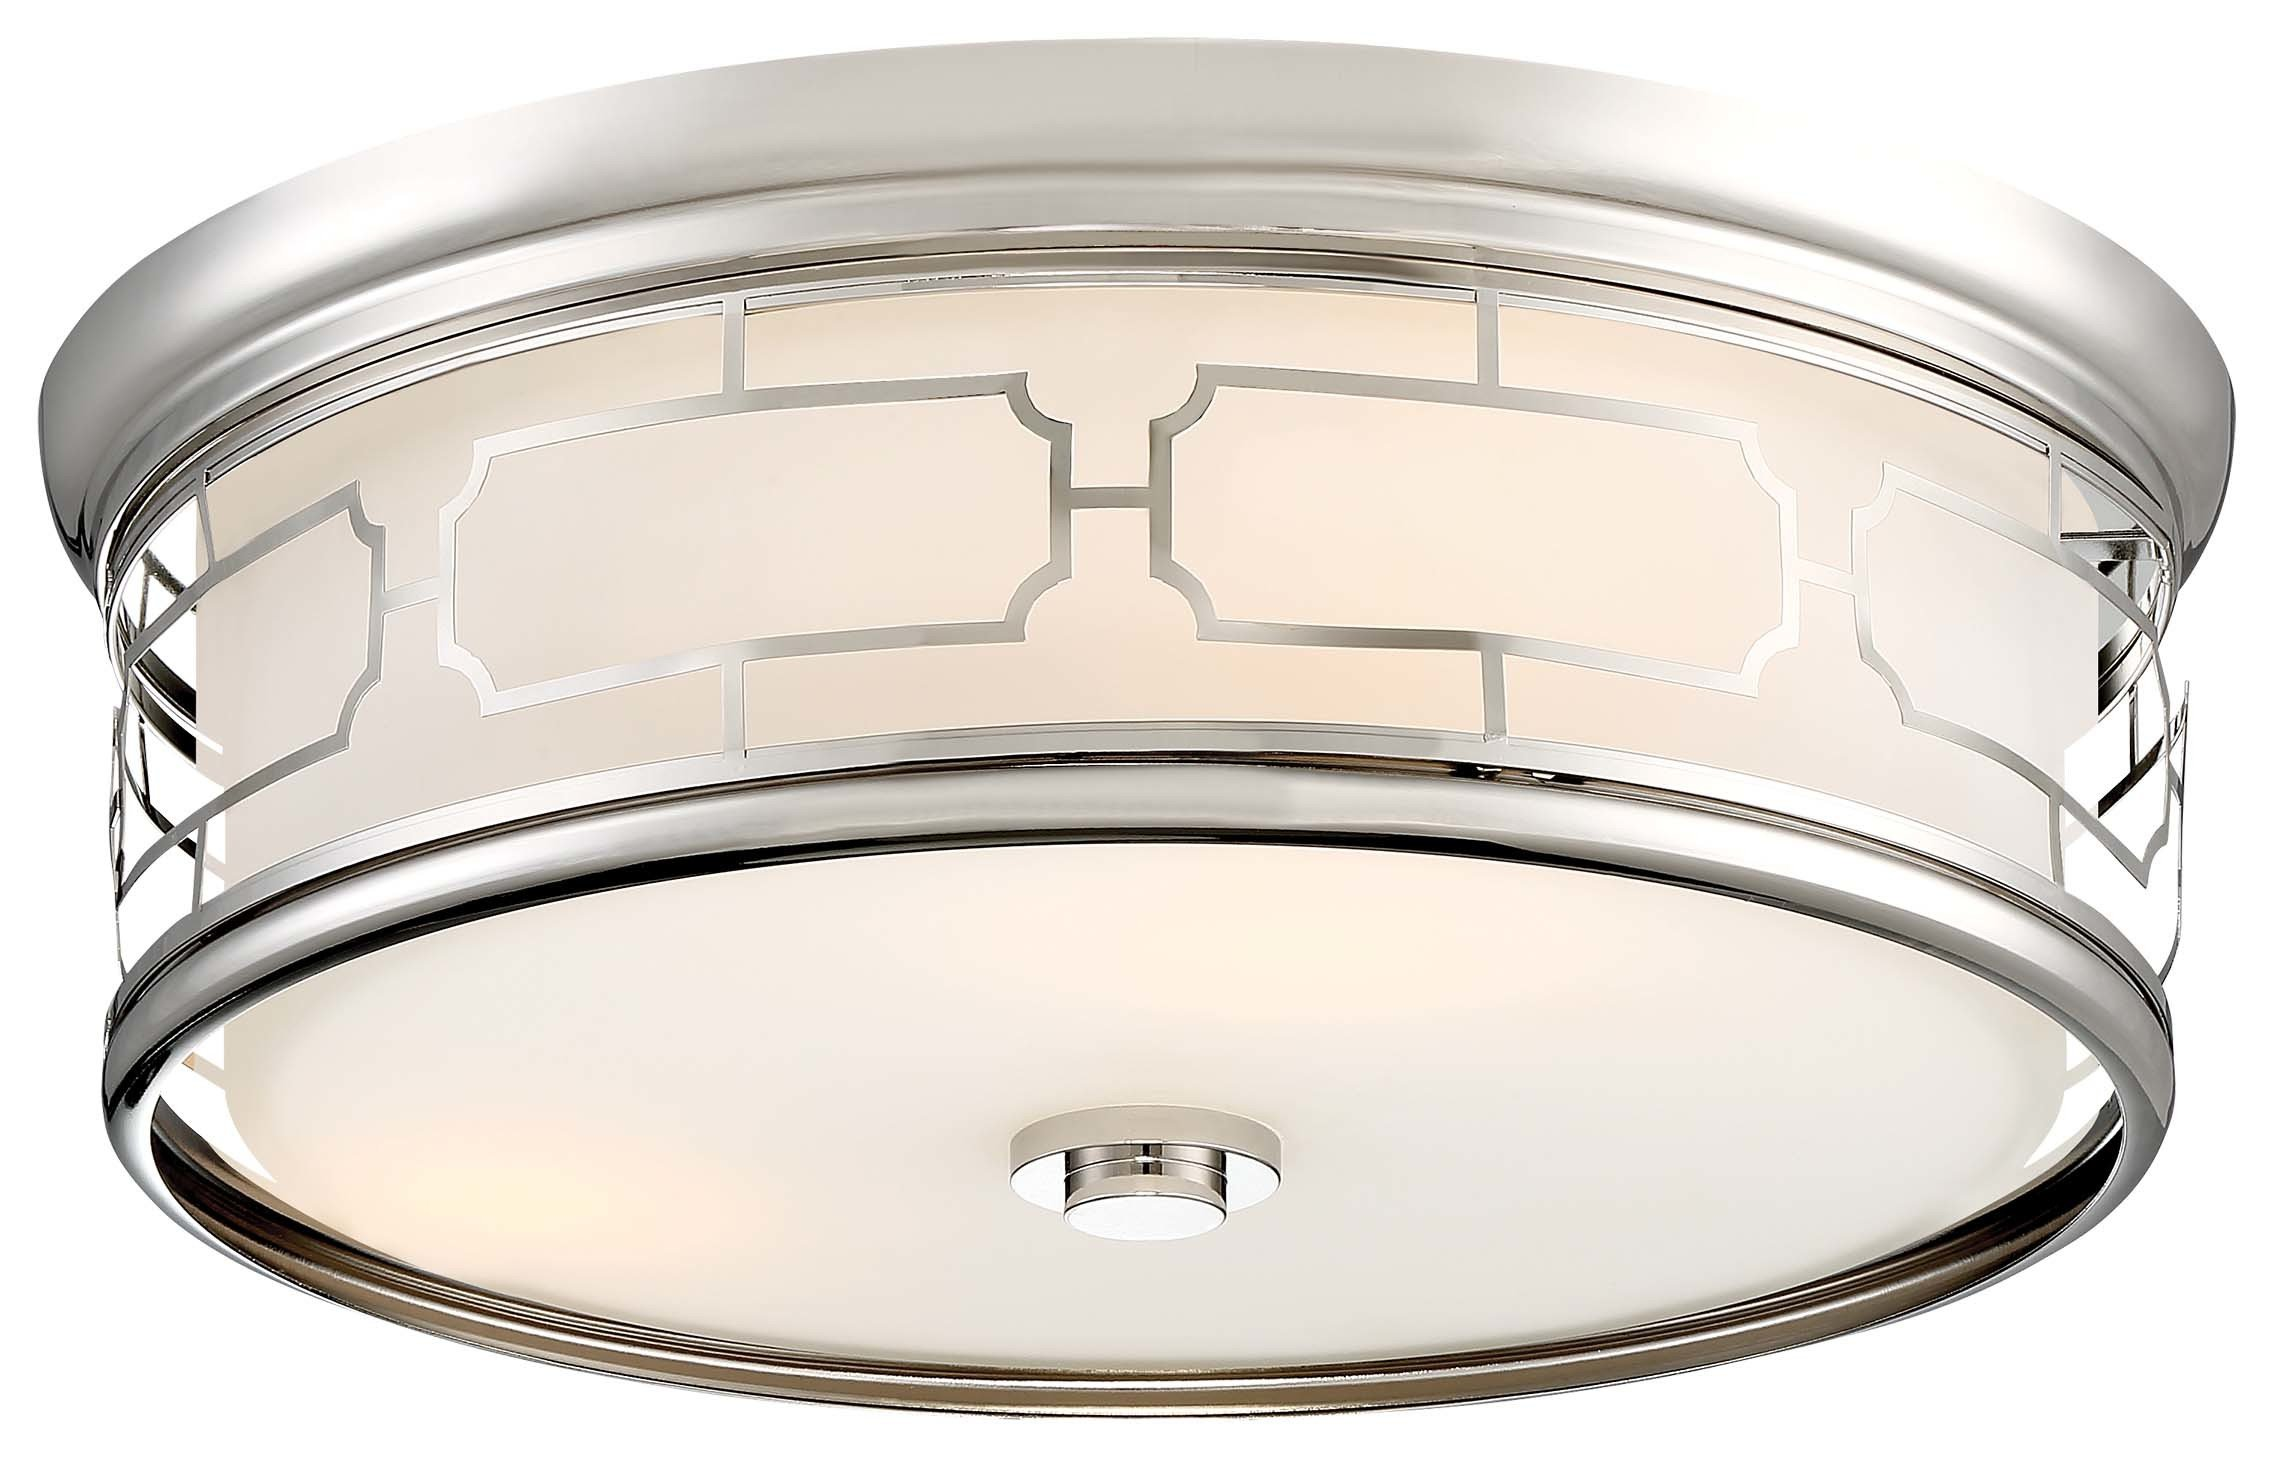 Minka Lavery 826-613 Polished Nickel Ceiling Light